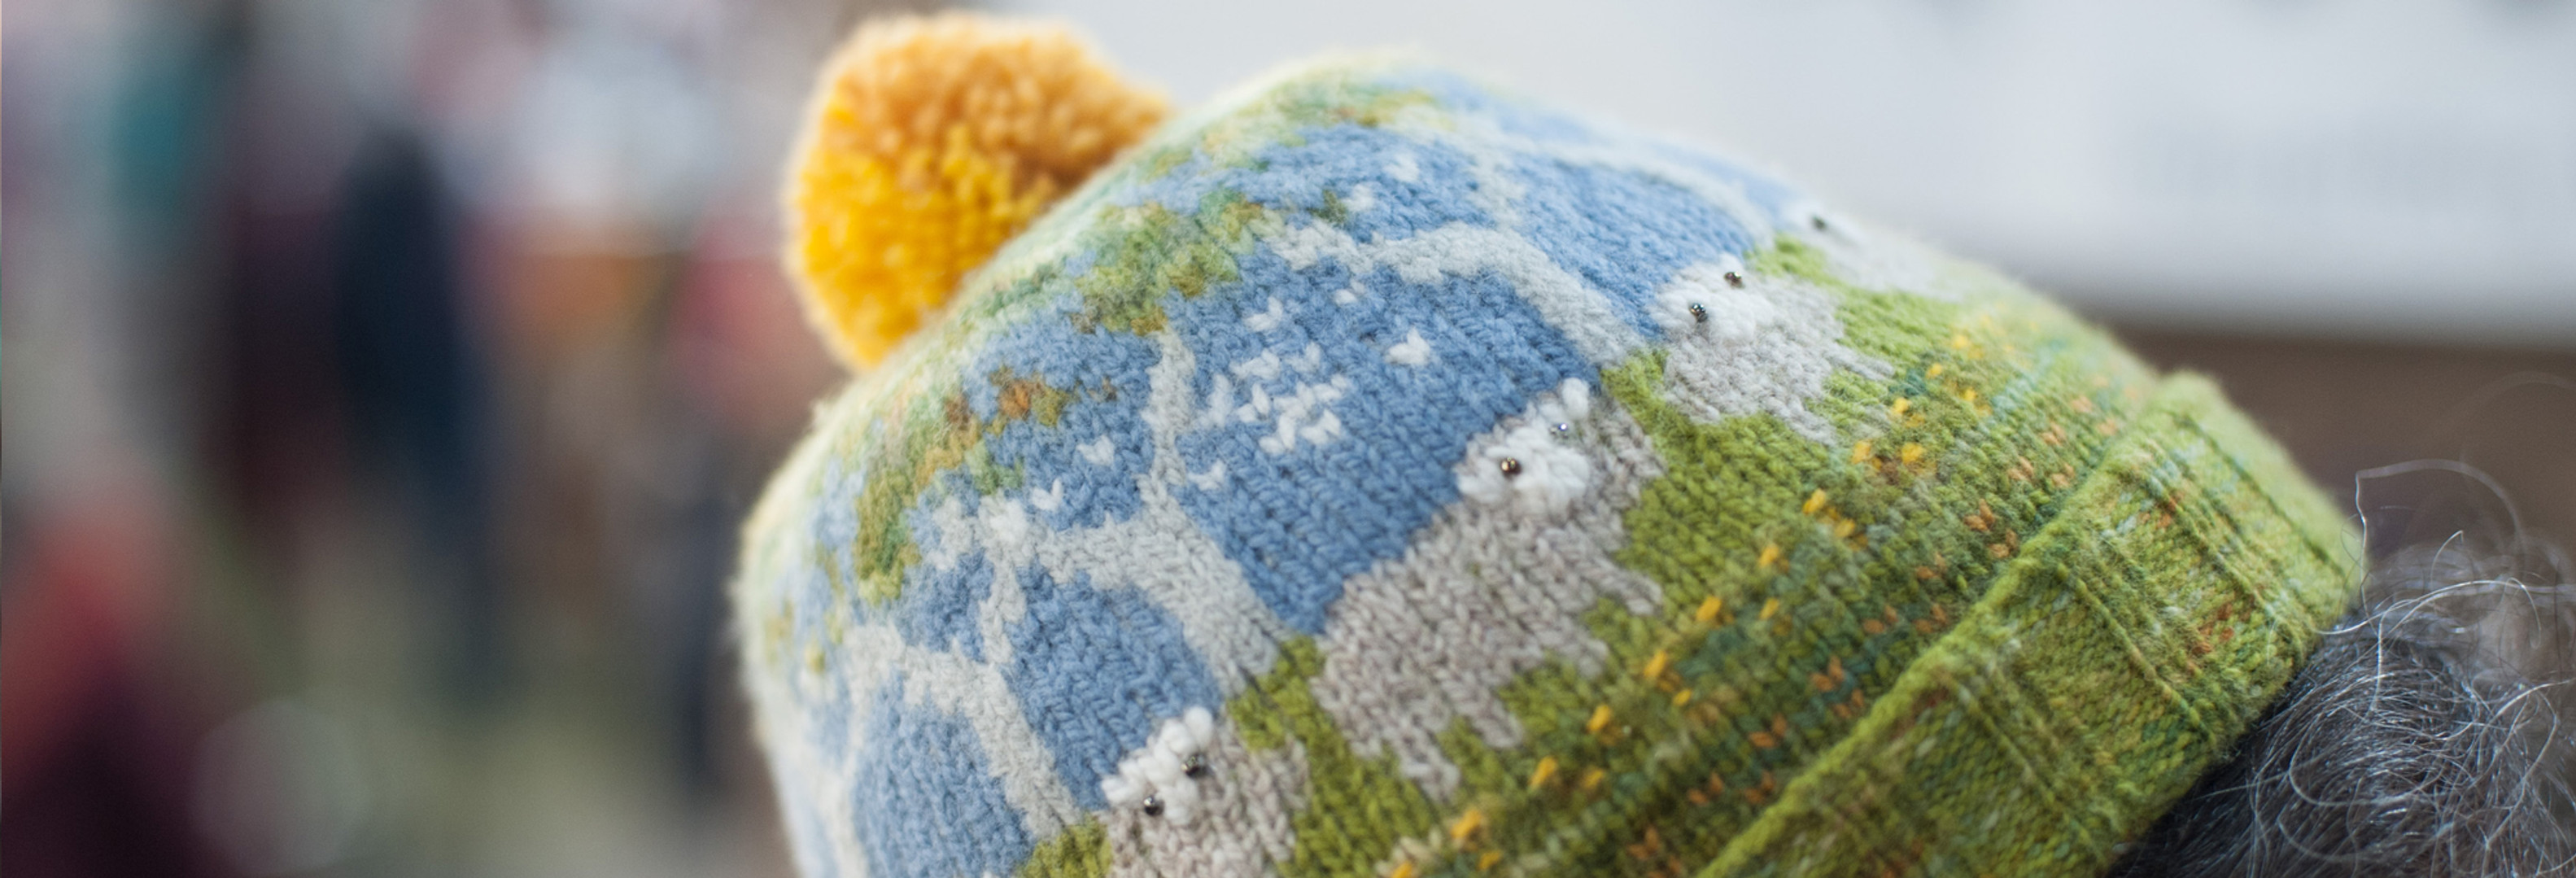 Millpost Merino Knitted4.jpg